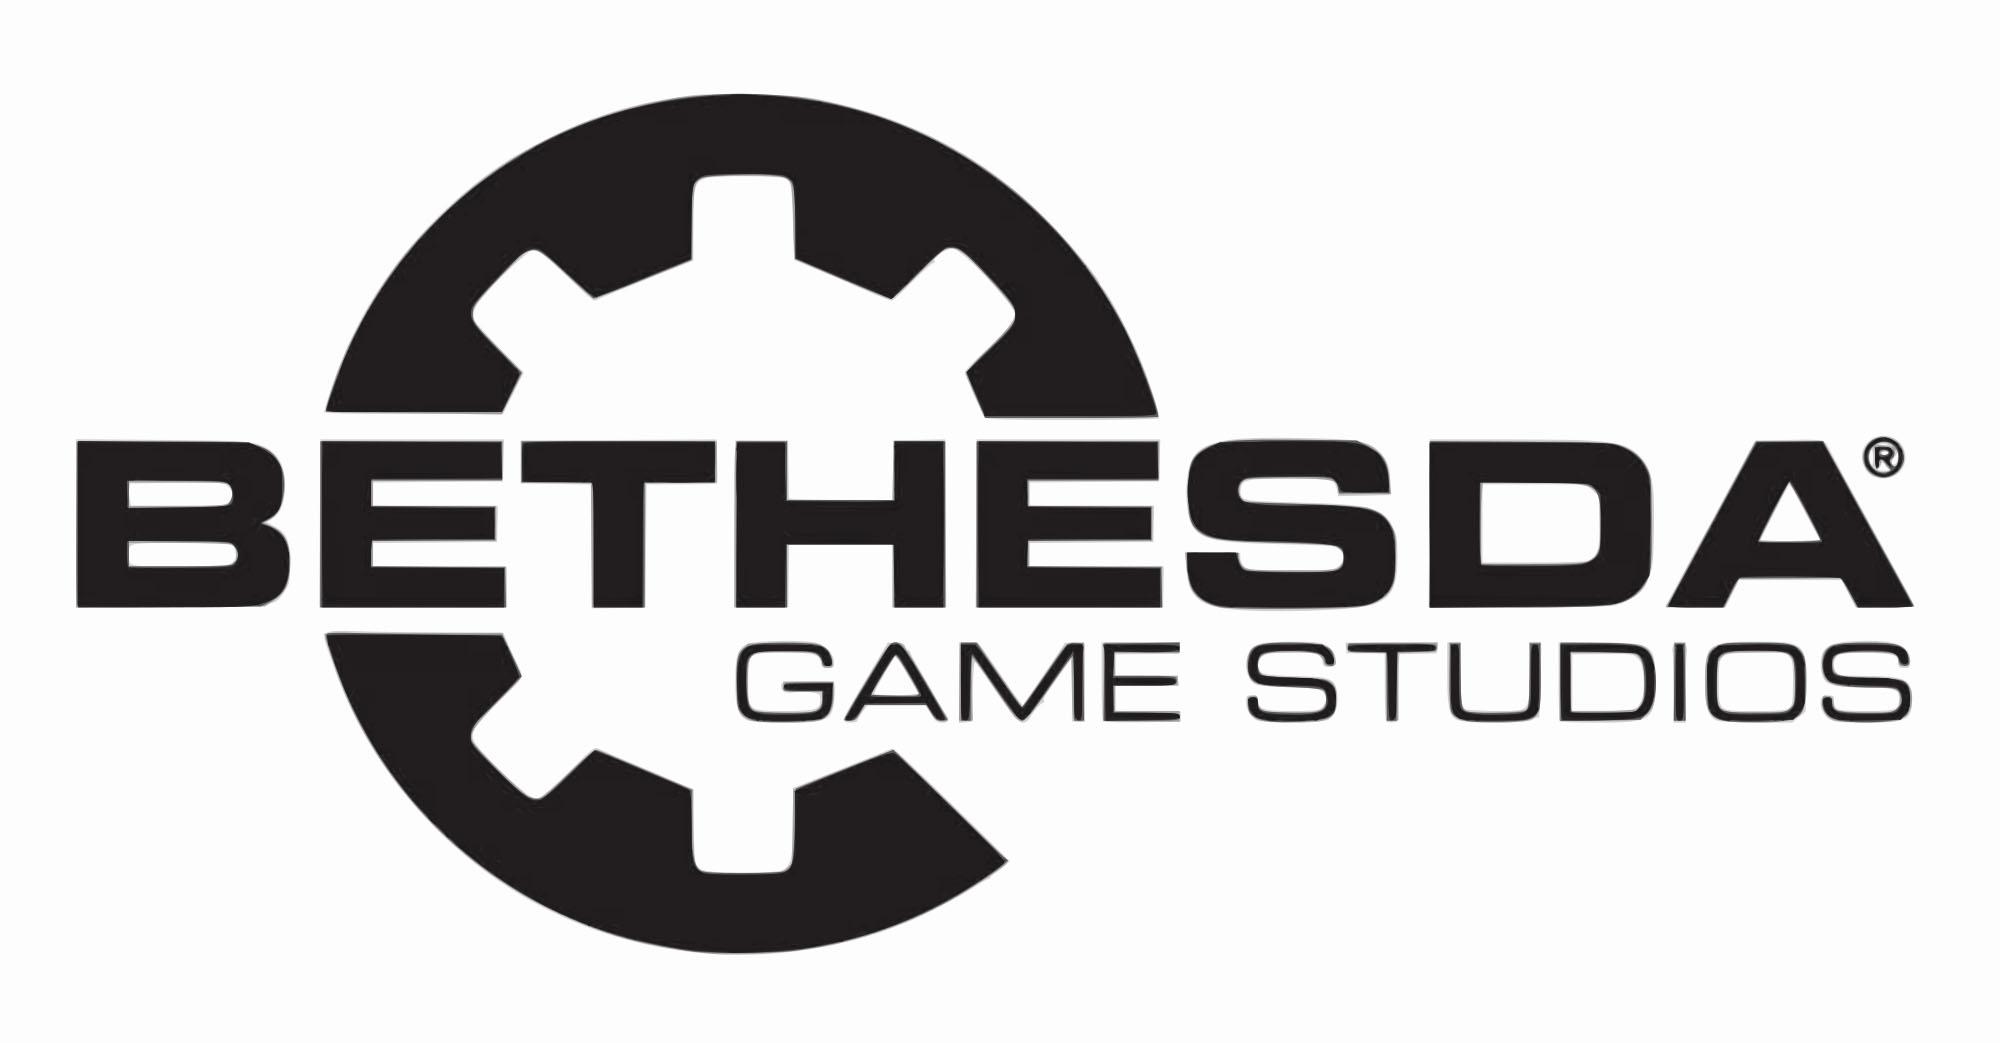 http://click.ir/wp-content/uploads/2016/06/Bethesda_Game_Studios_logo.jpg